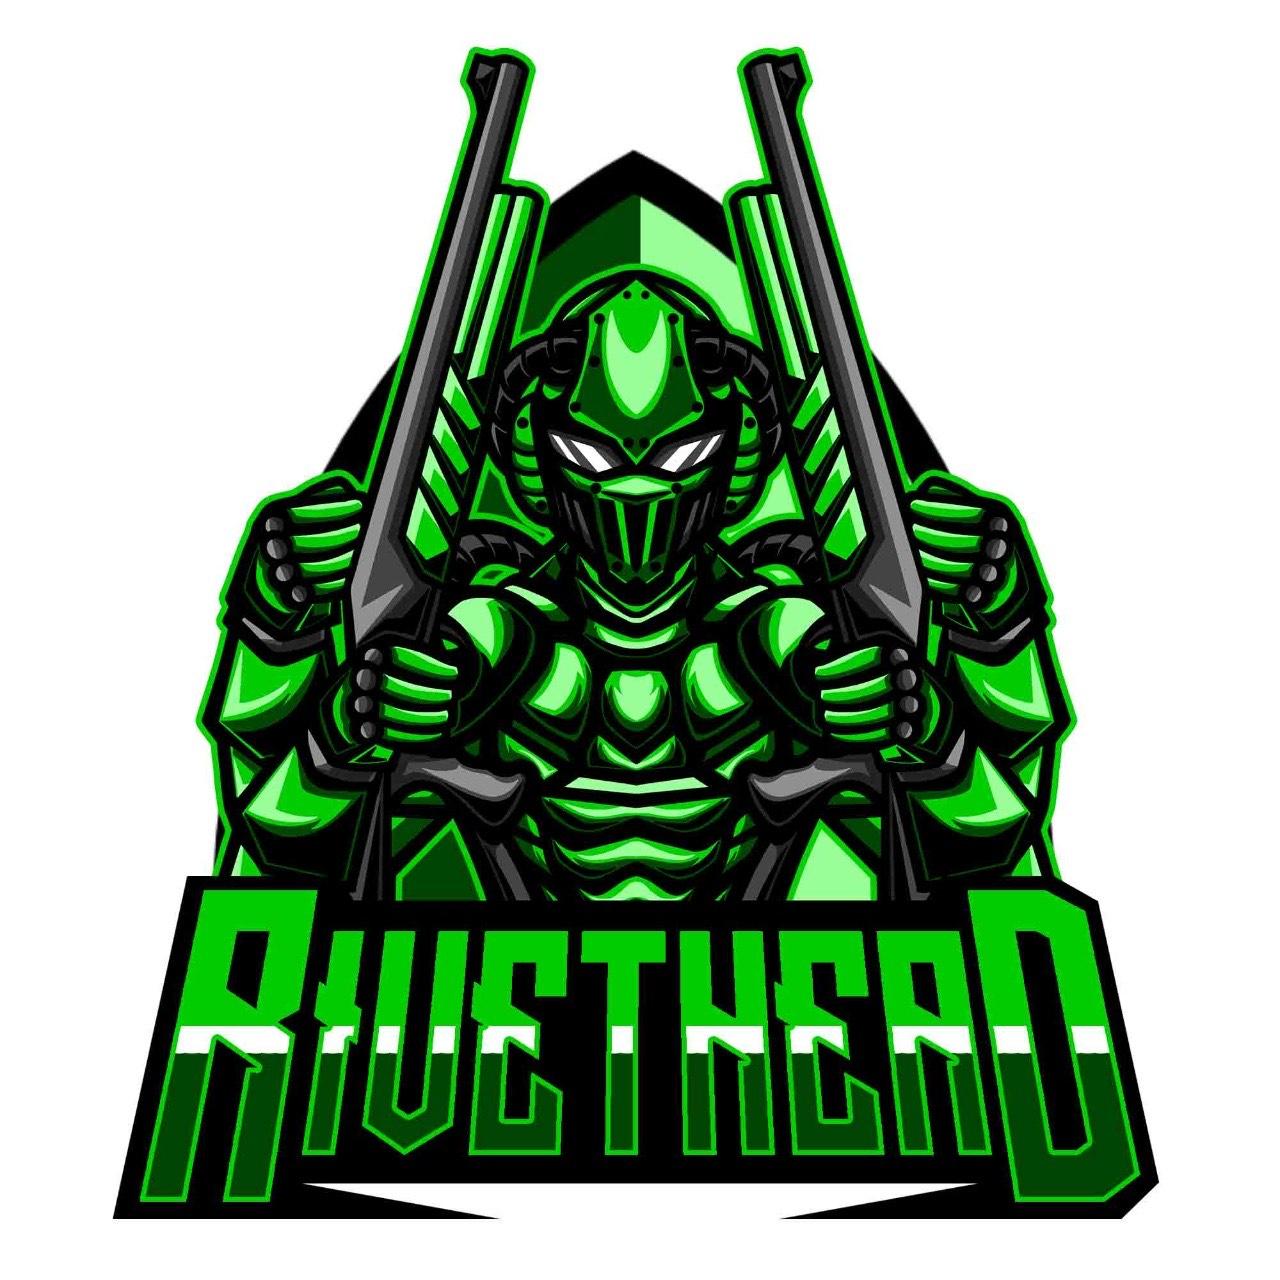 RIVETHEAD green logo